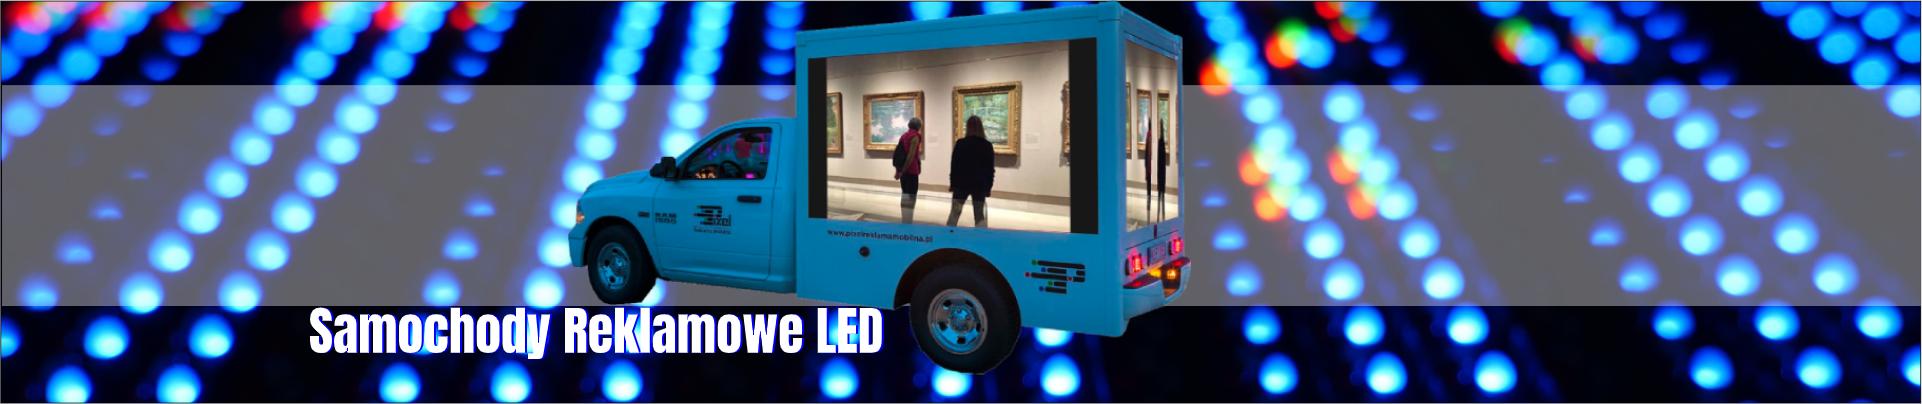 samochody_reklamowe_LED_9